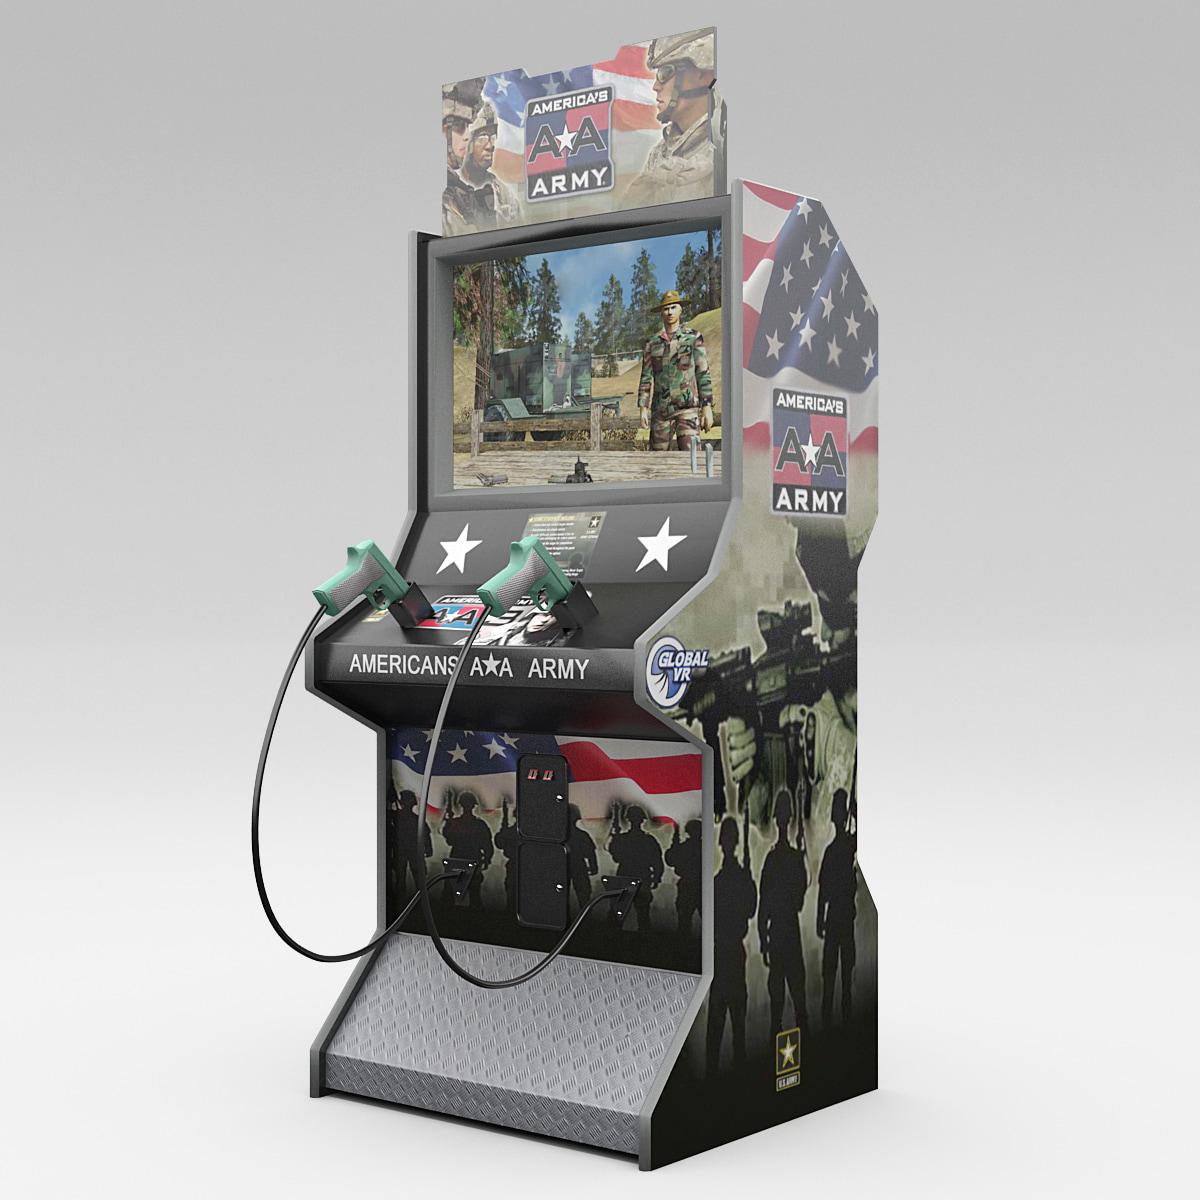 Arcade_Game_Americas_Army_0000.jpg